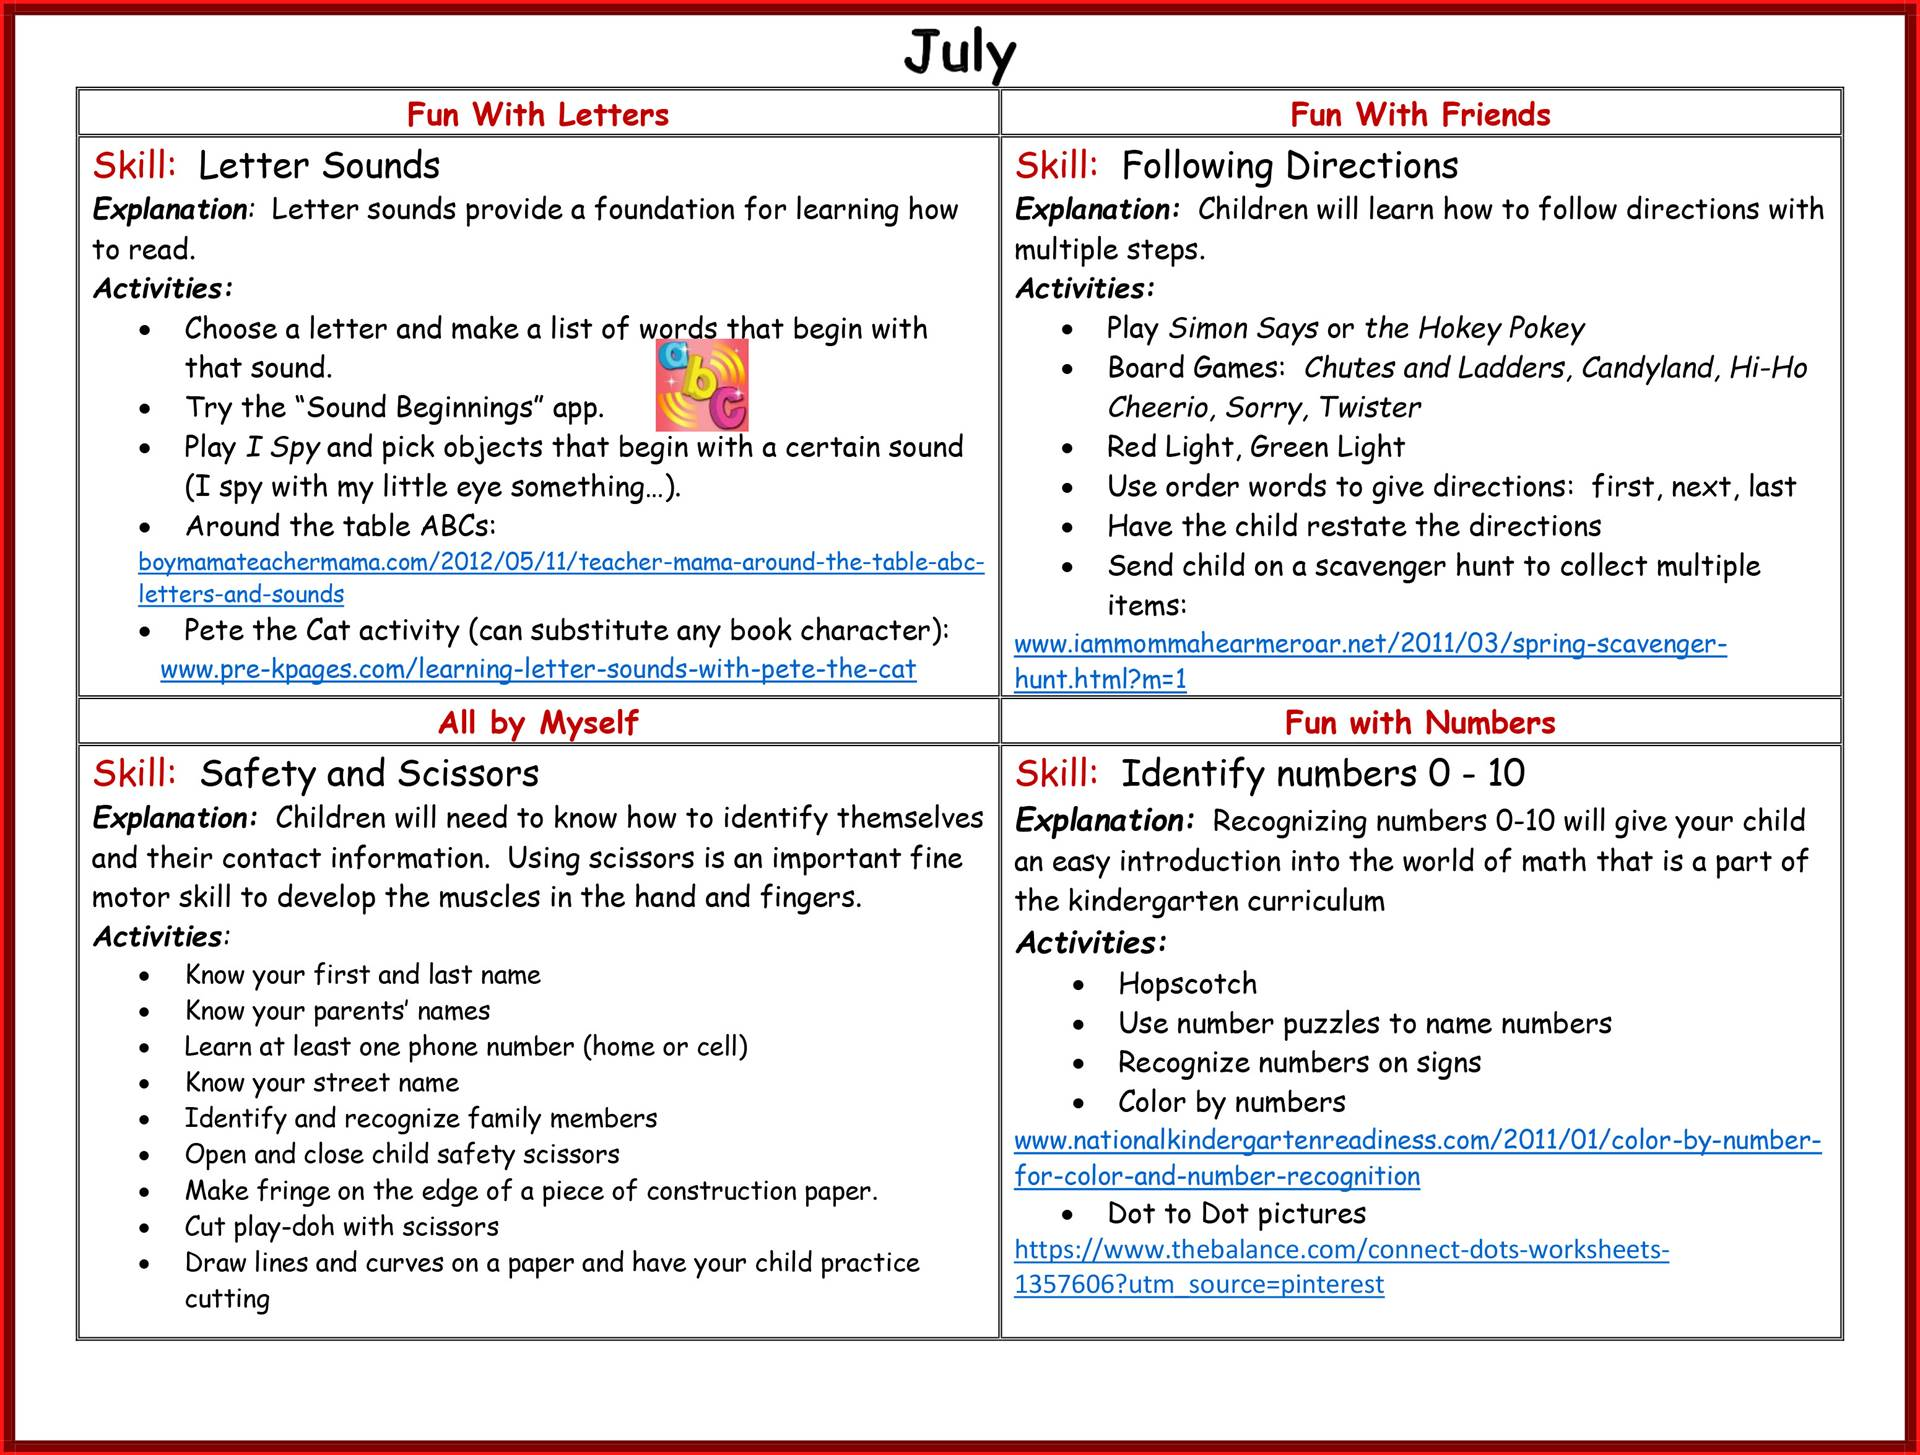 Kindergarten Readiness Calendar - July page 2